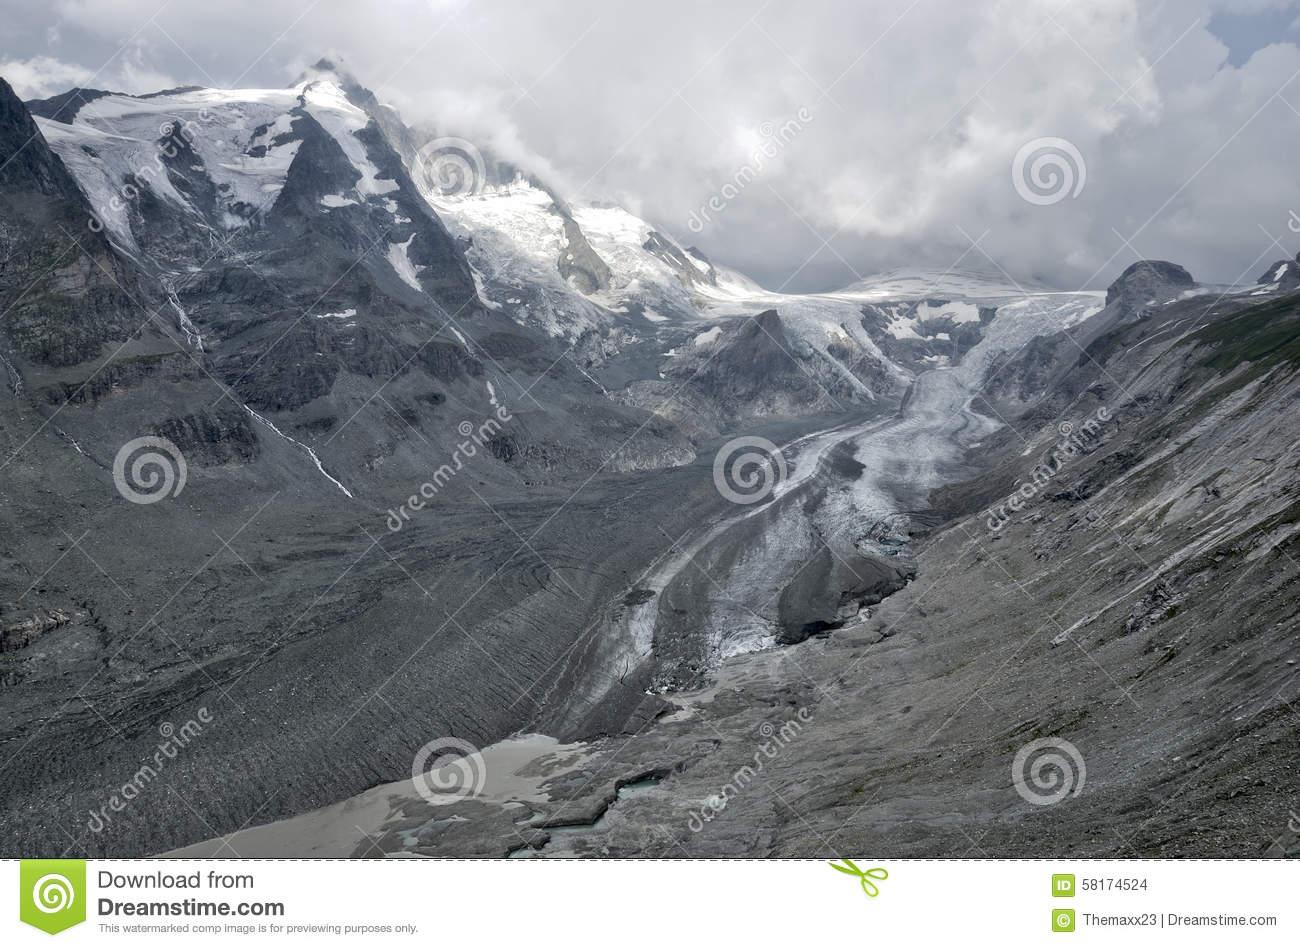 Austria Pasterze Glacier Panorama Melt Stock Photo.